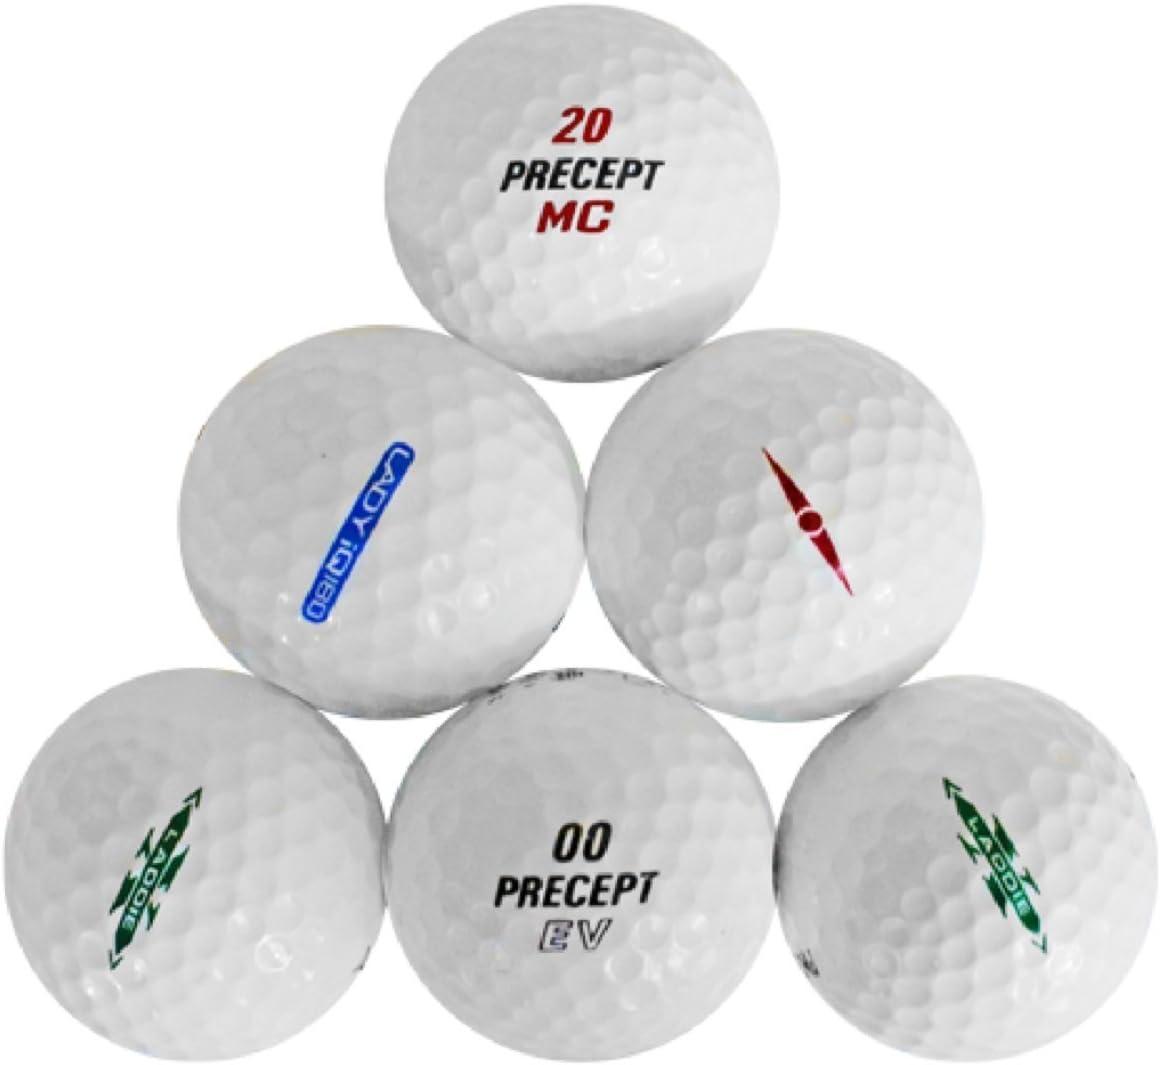 Precept 10 Dozen Assorted Near Mint AAAA Recycled Used Golf Balls